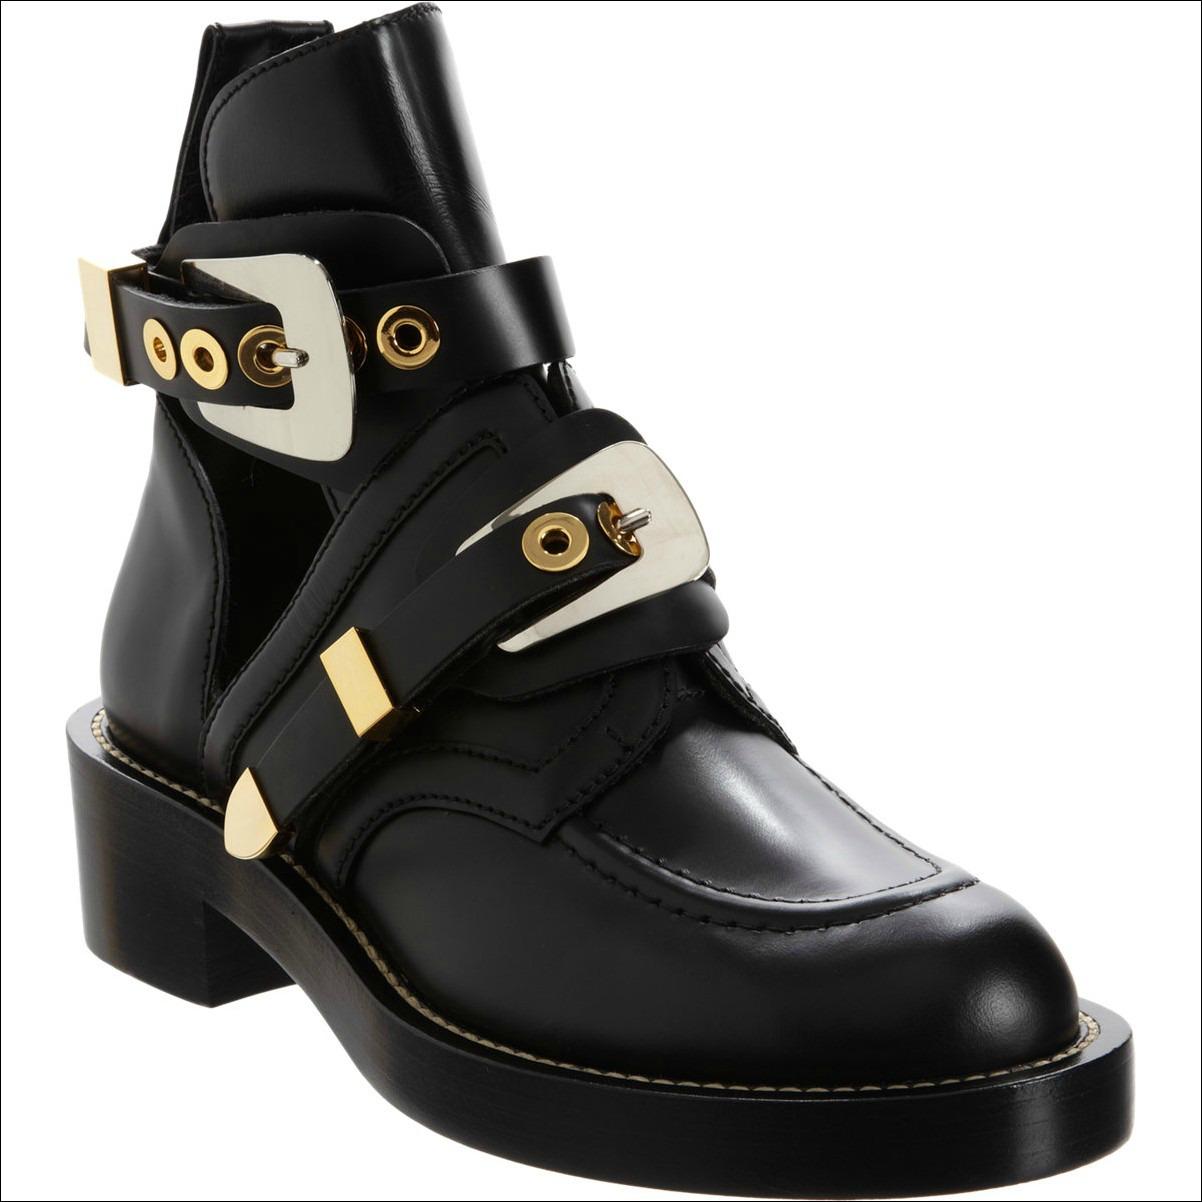 Balenciaga-Shoes-Black.jpg